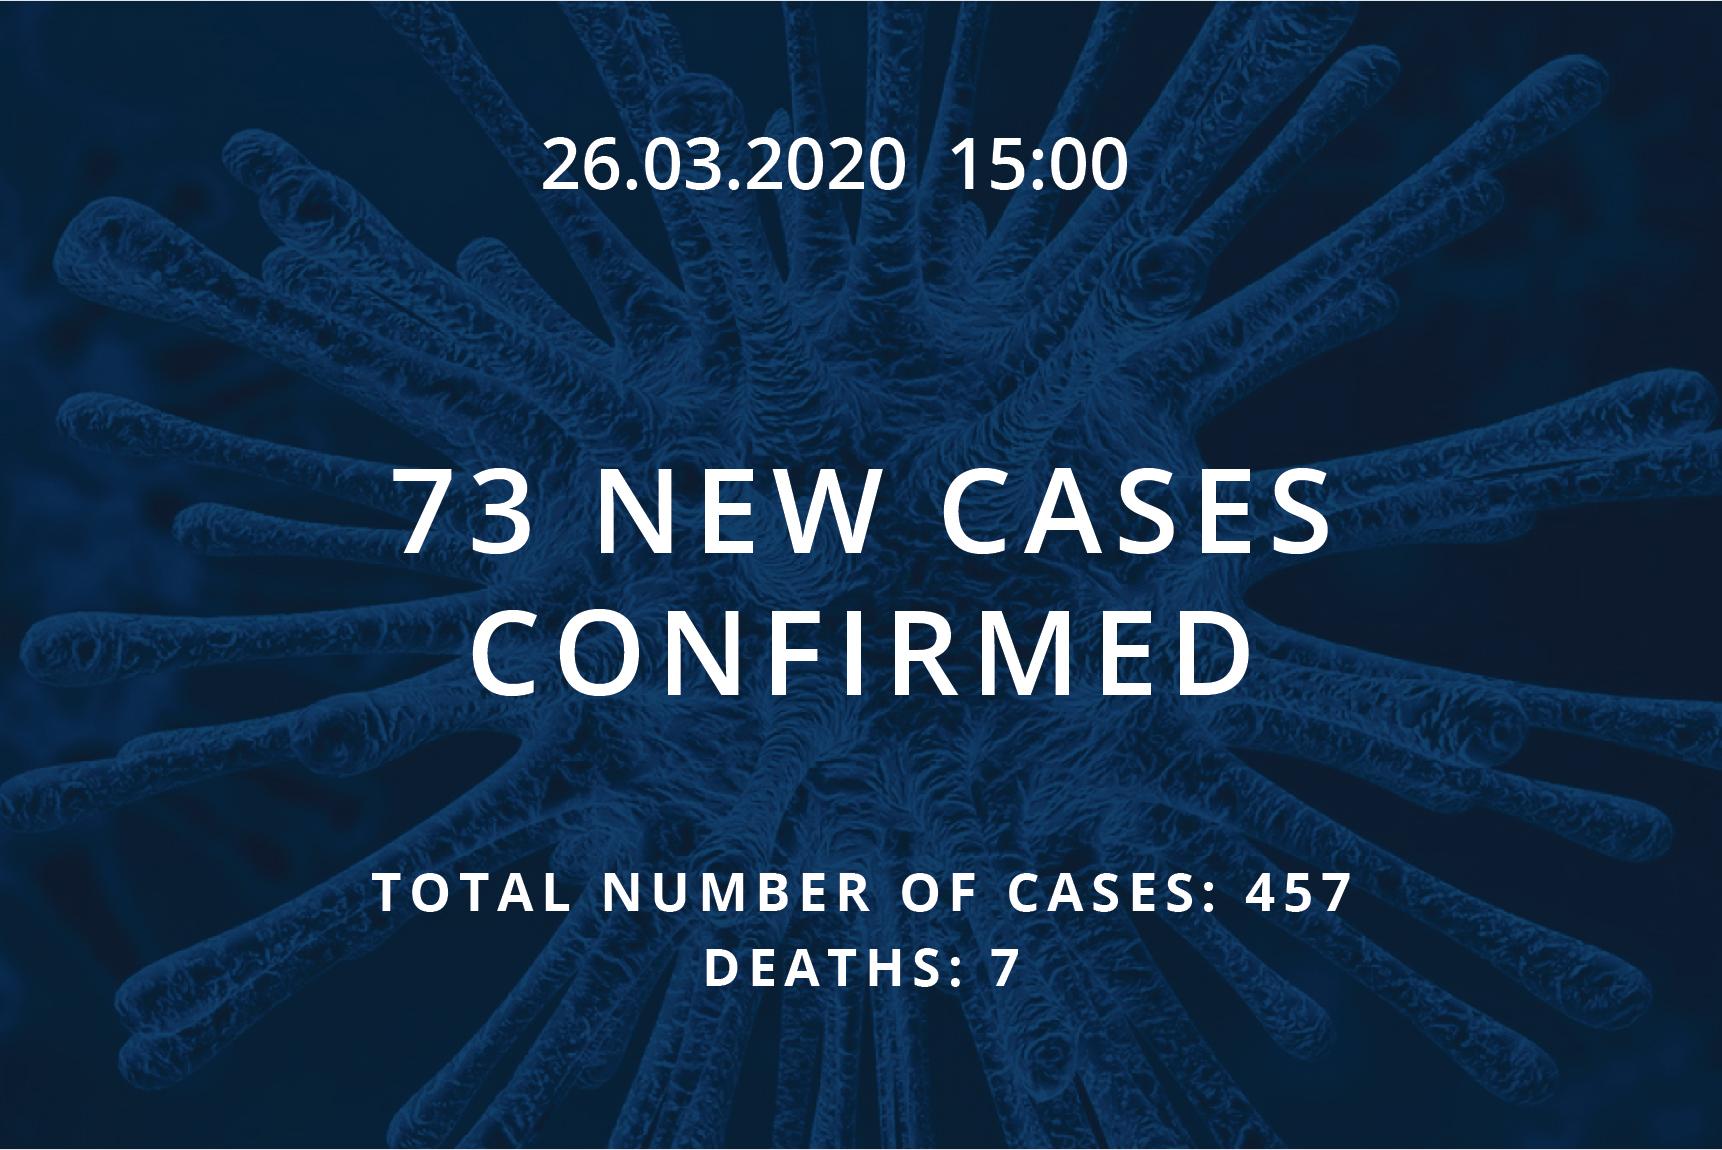 Information about coronavirus COVID-19, 26.03.2020 at 15:00